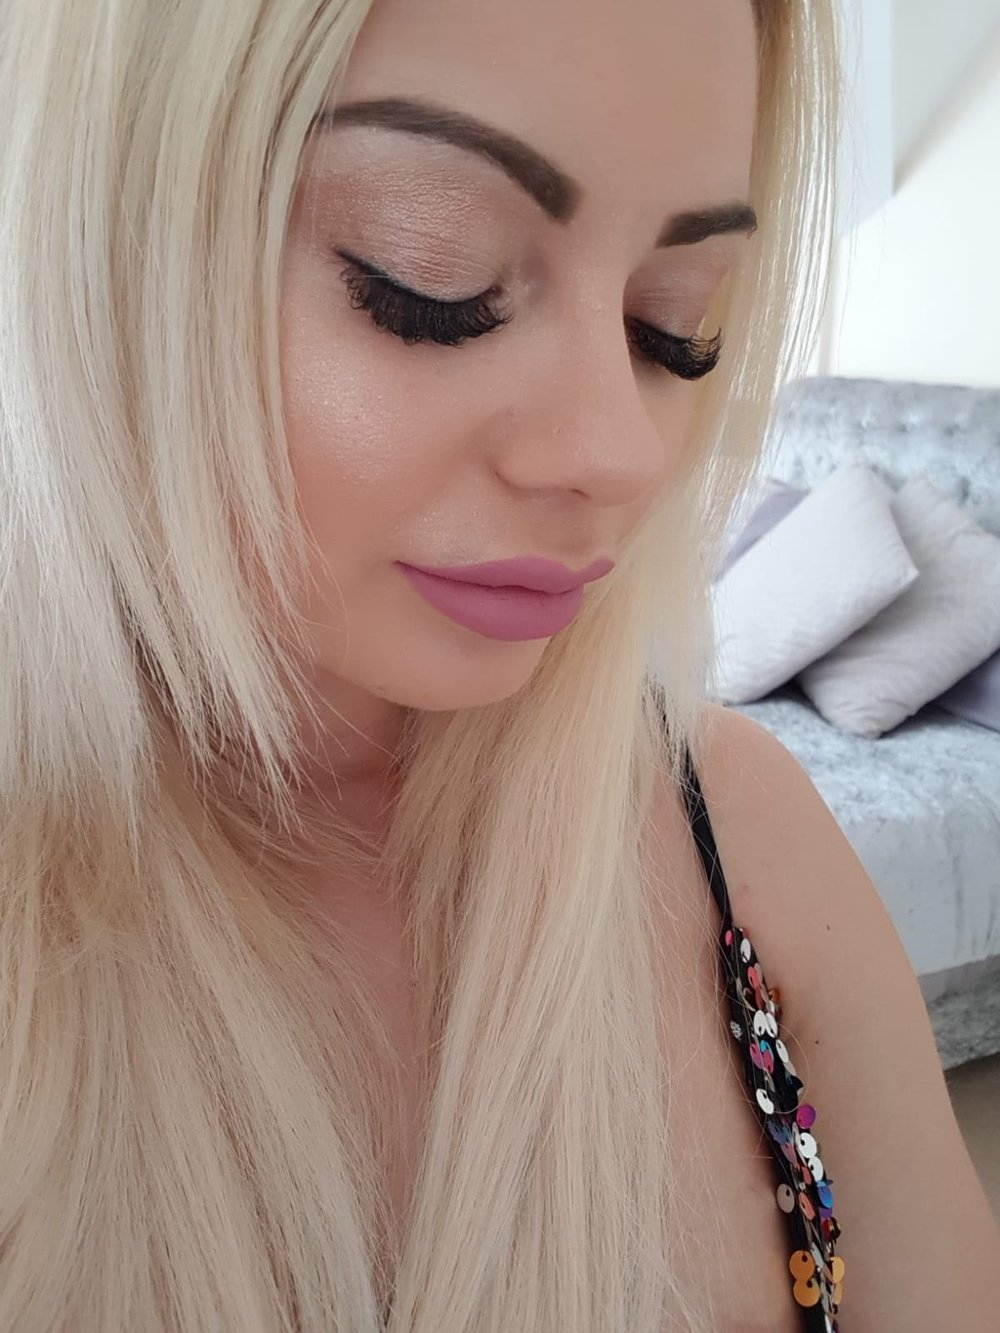 Layla Vardy's Botox at Escape Aesthetics, Luton